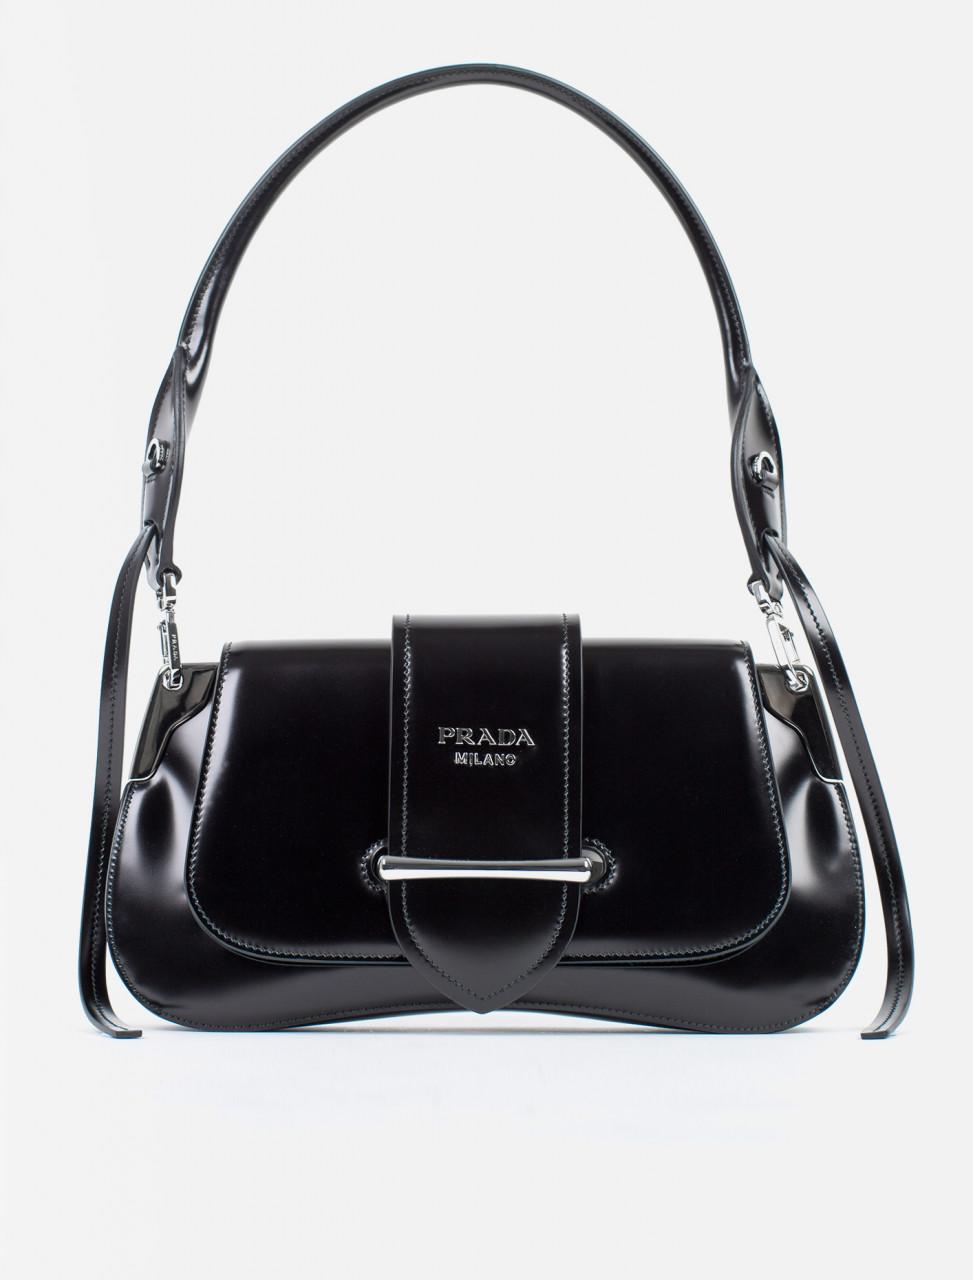 Prada Logo Handbag